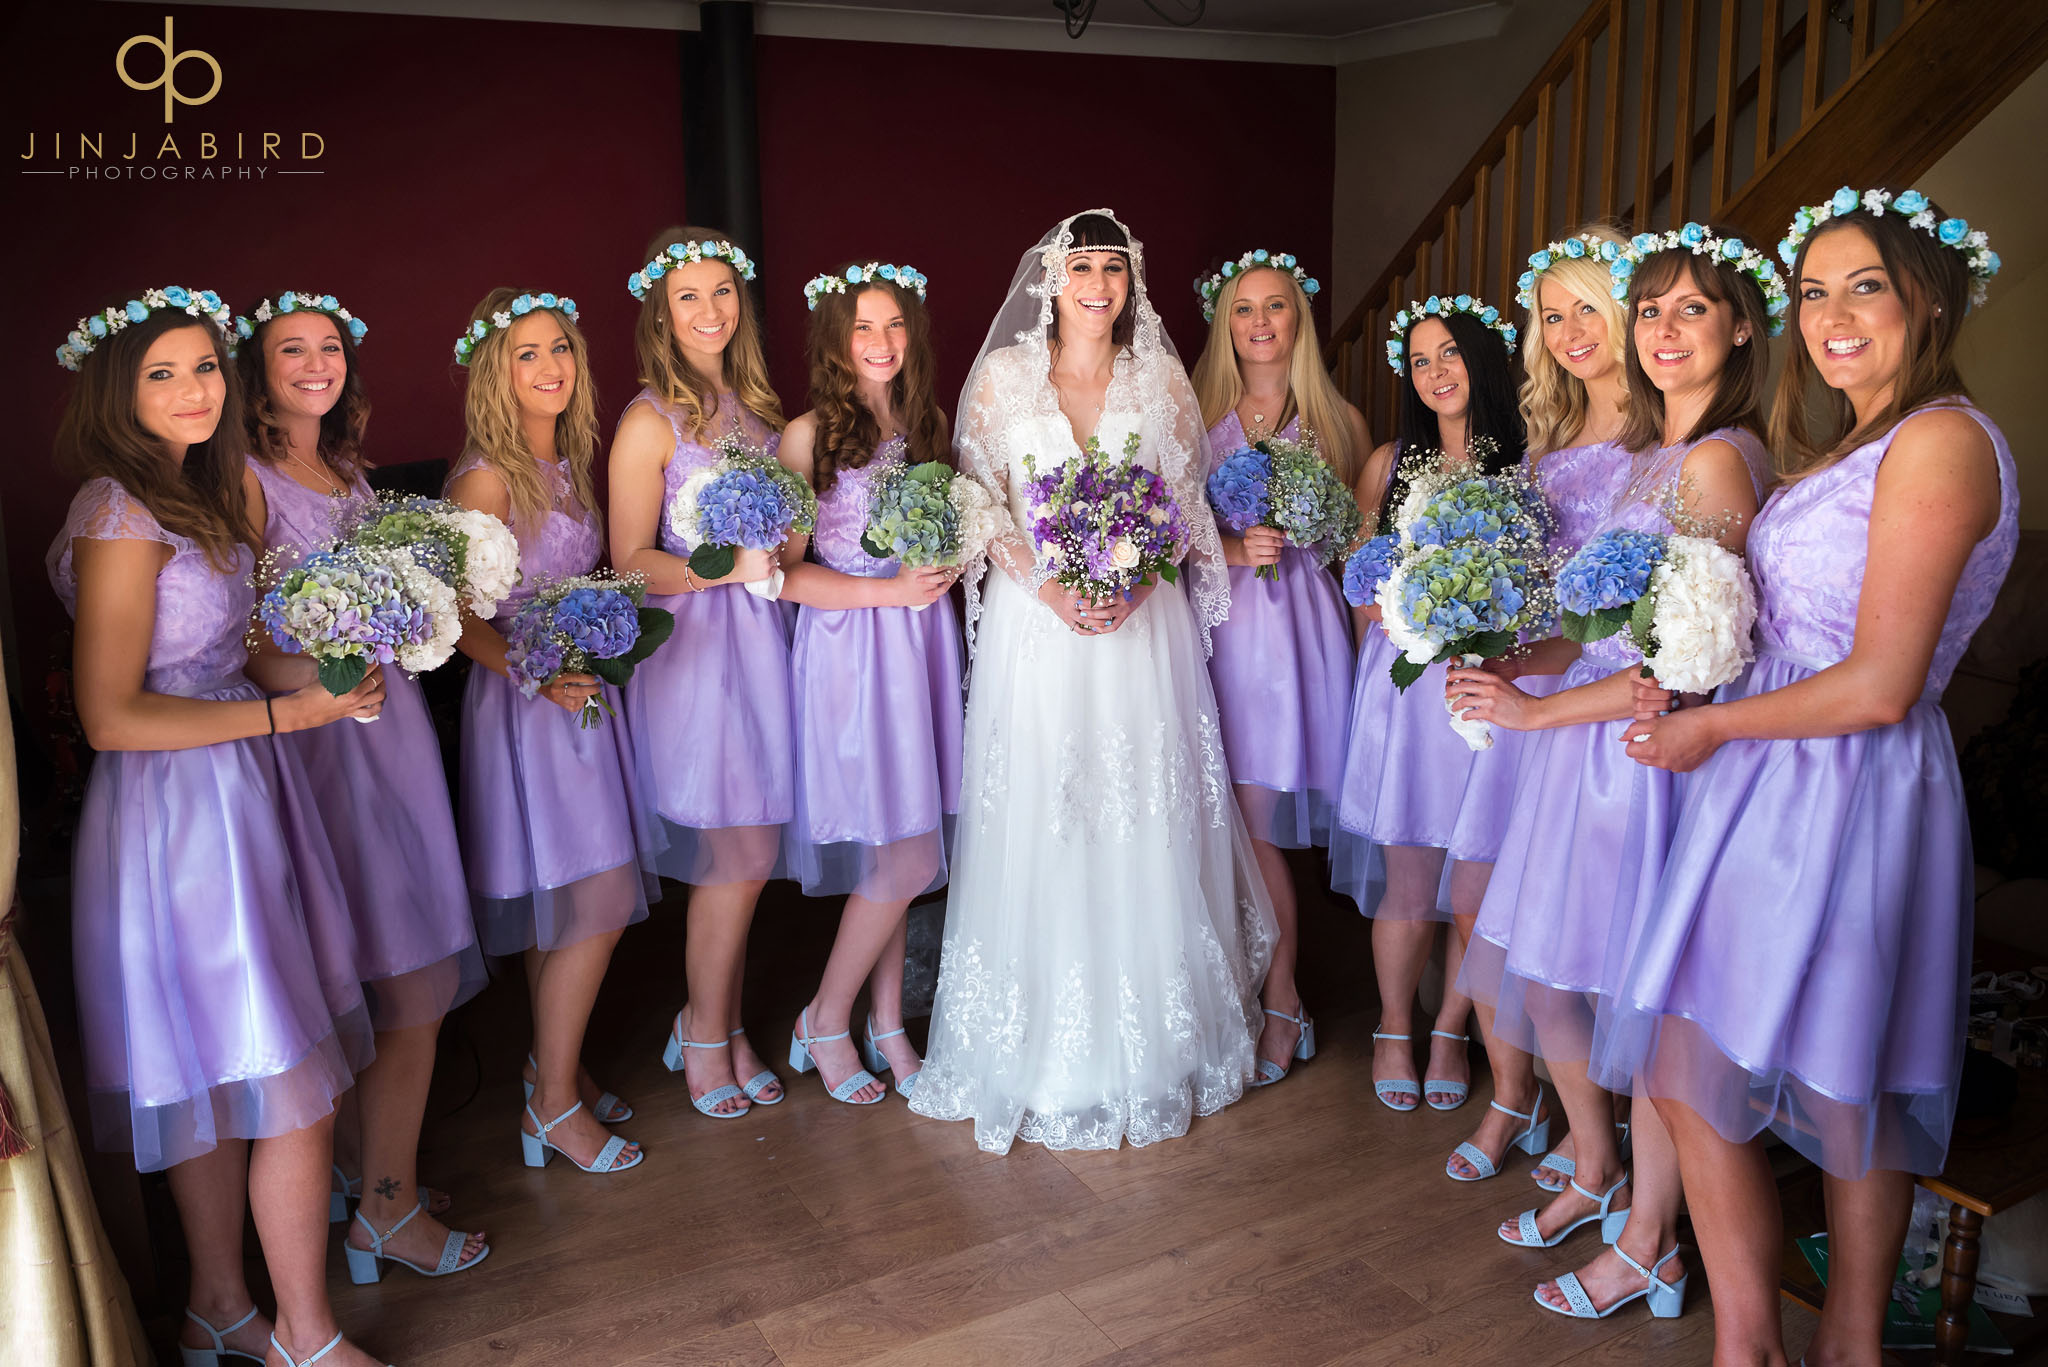 Wedding photography Peterborough